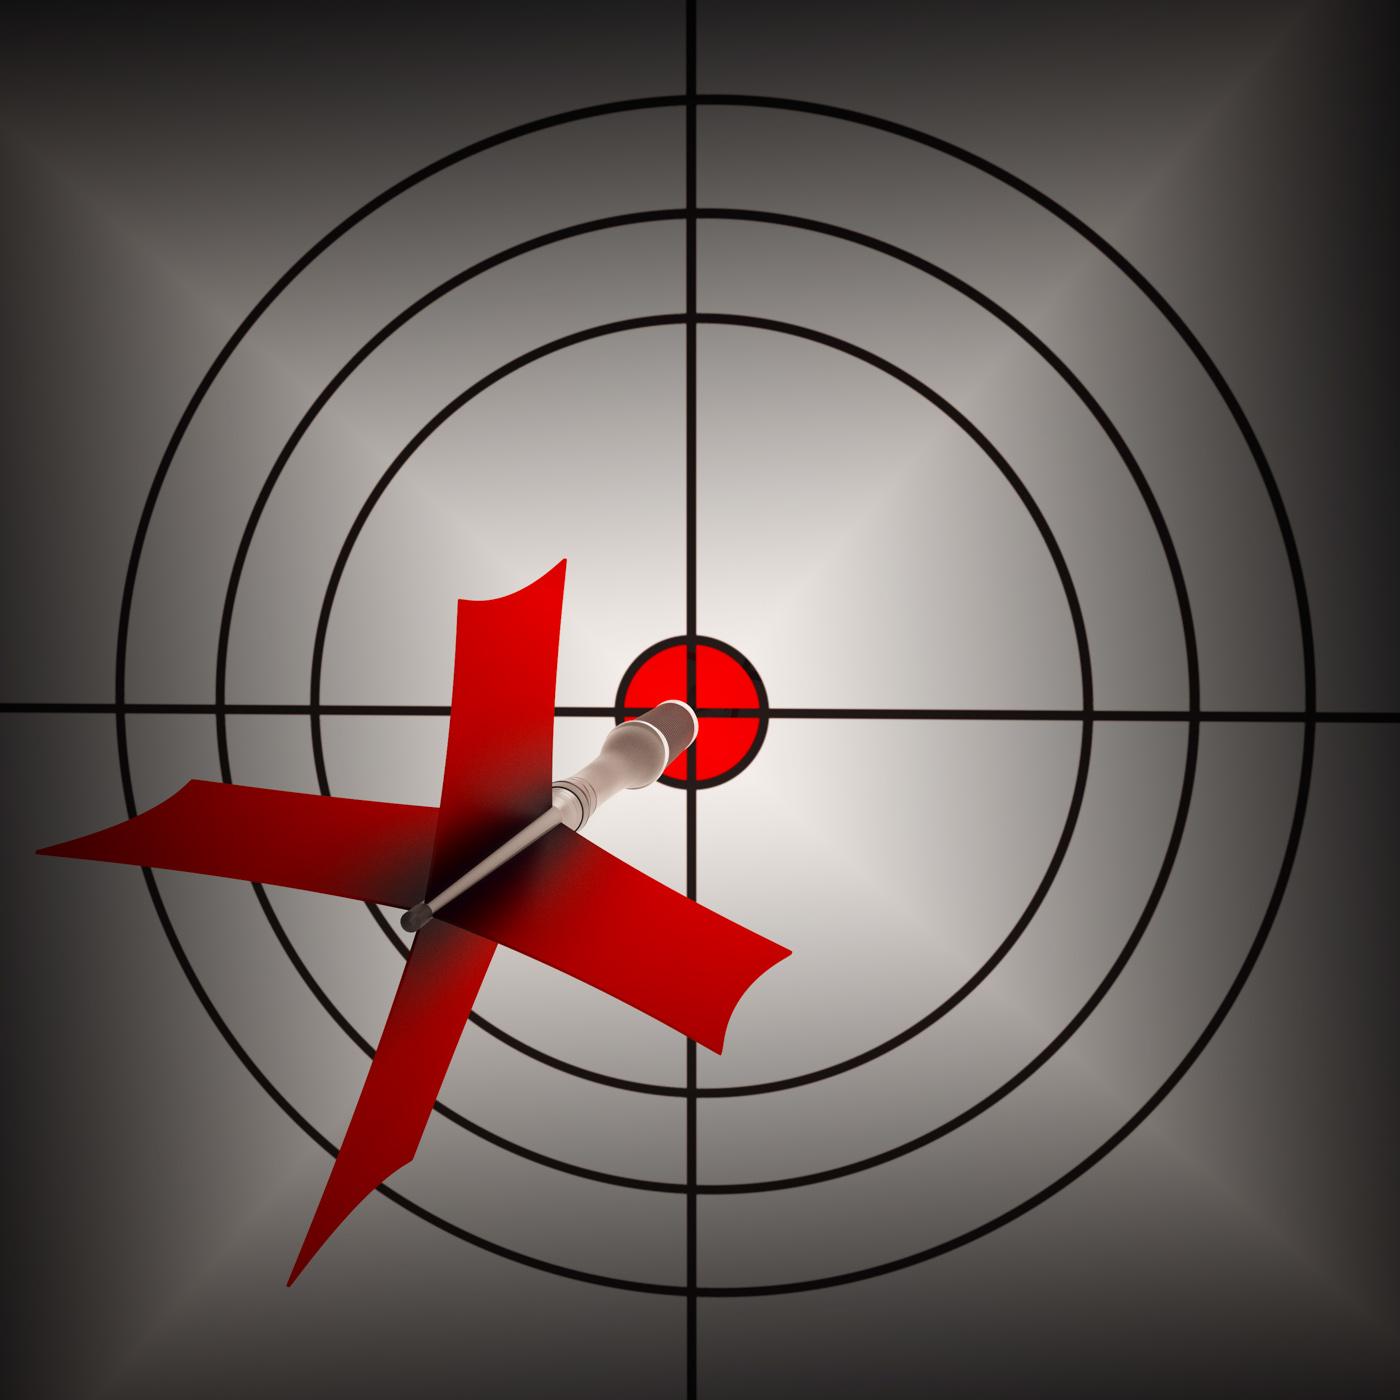 Arrow aiming on dartboard shows aiming accuracy photo